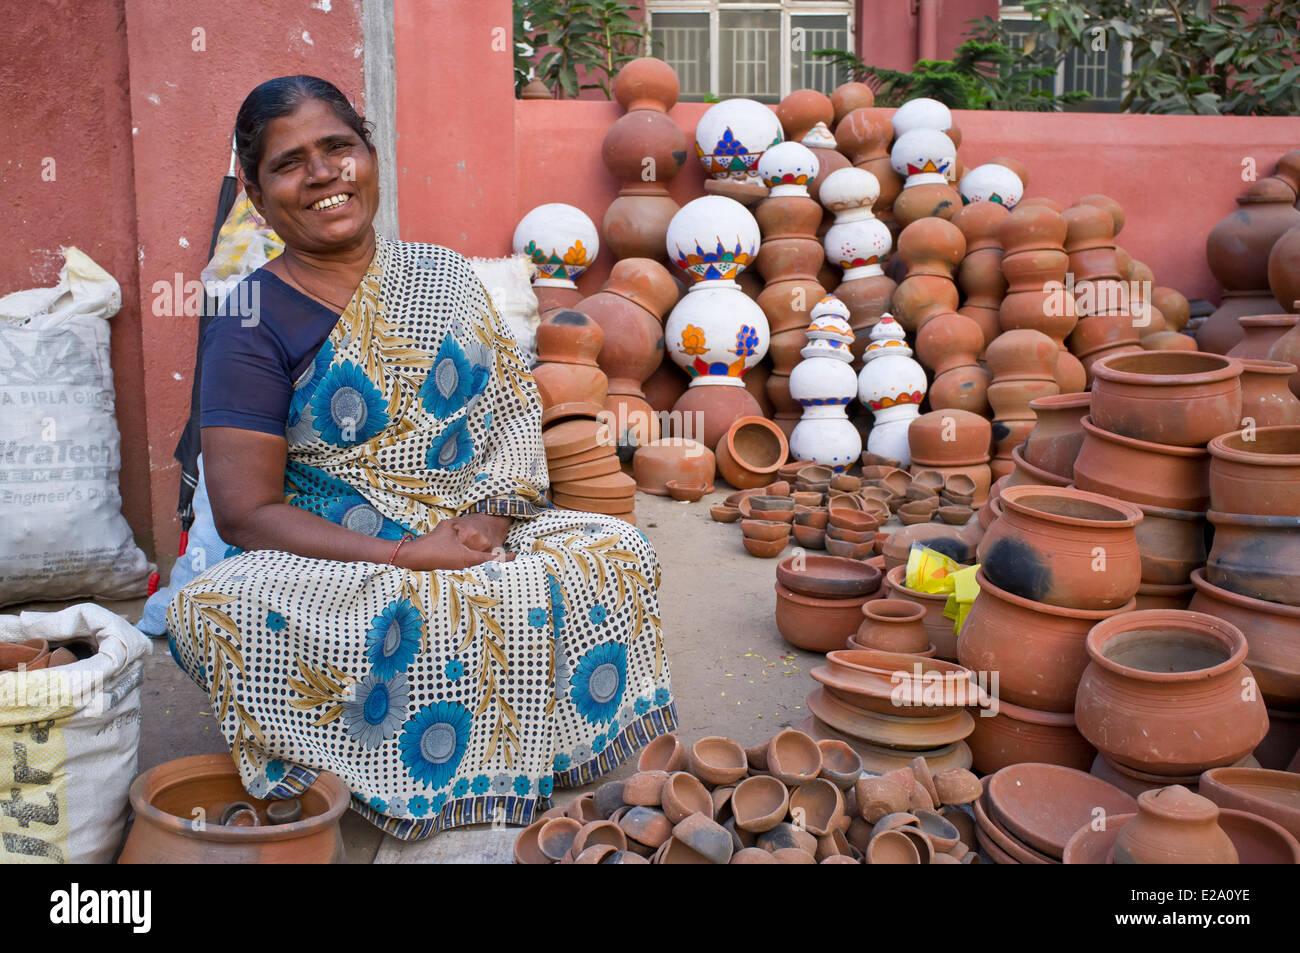 India, Tamil Nadu state, Tiruvannamalai, a potteries saleswoman - Stock Image